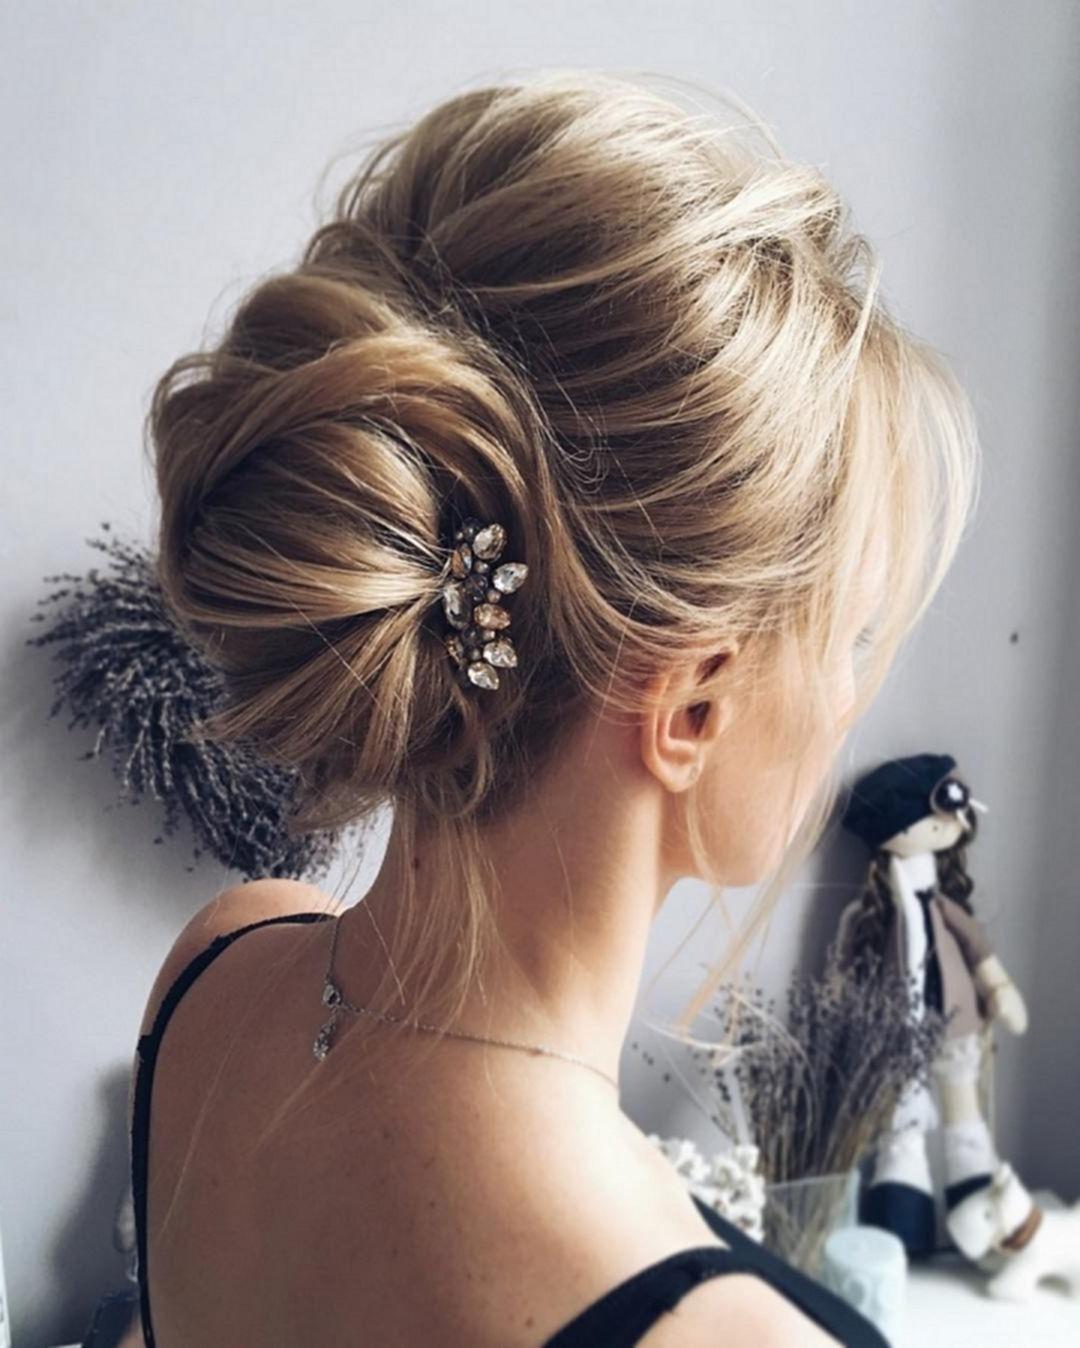 60+ Wonderful Bridesmaid Updo Hairstyles | Bridesmaid Updo For Long Hair Updo Hairstyles For Over (View 10 of 15)